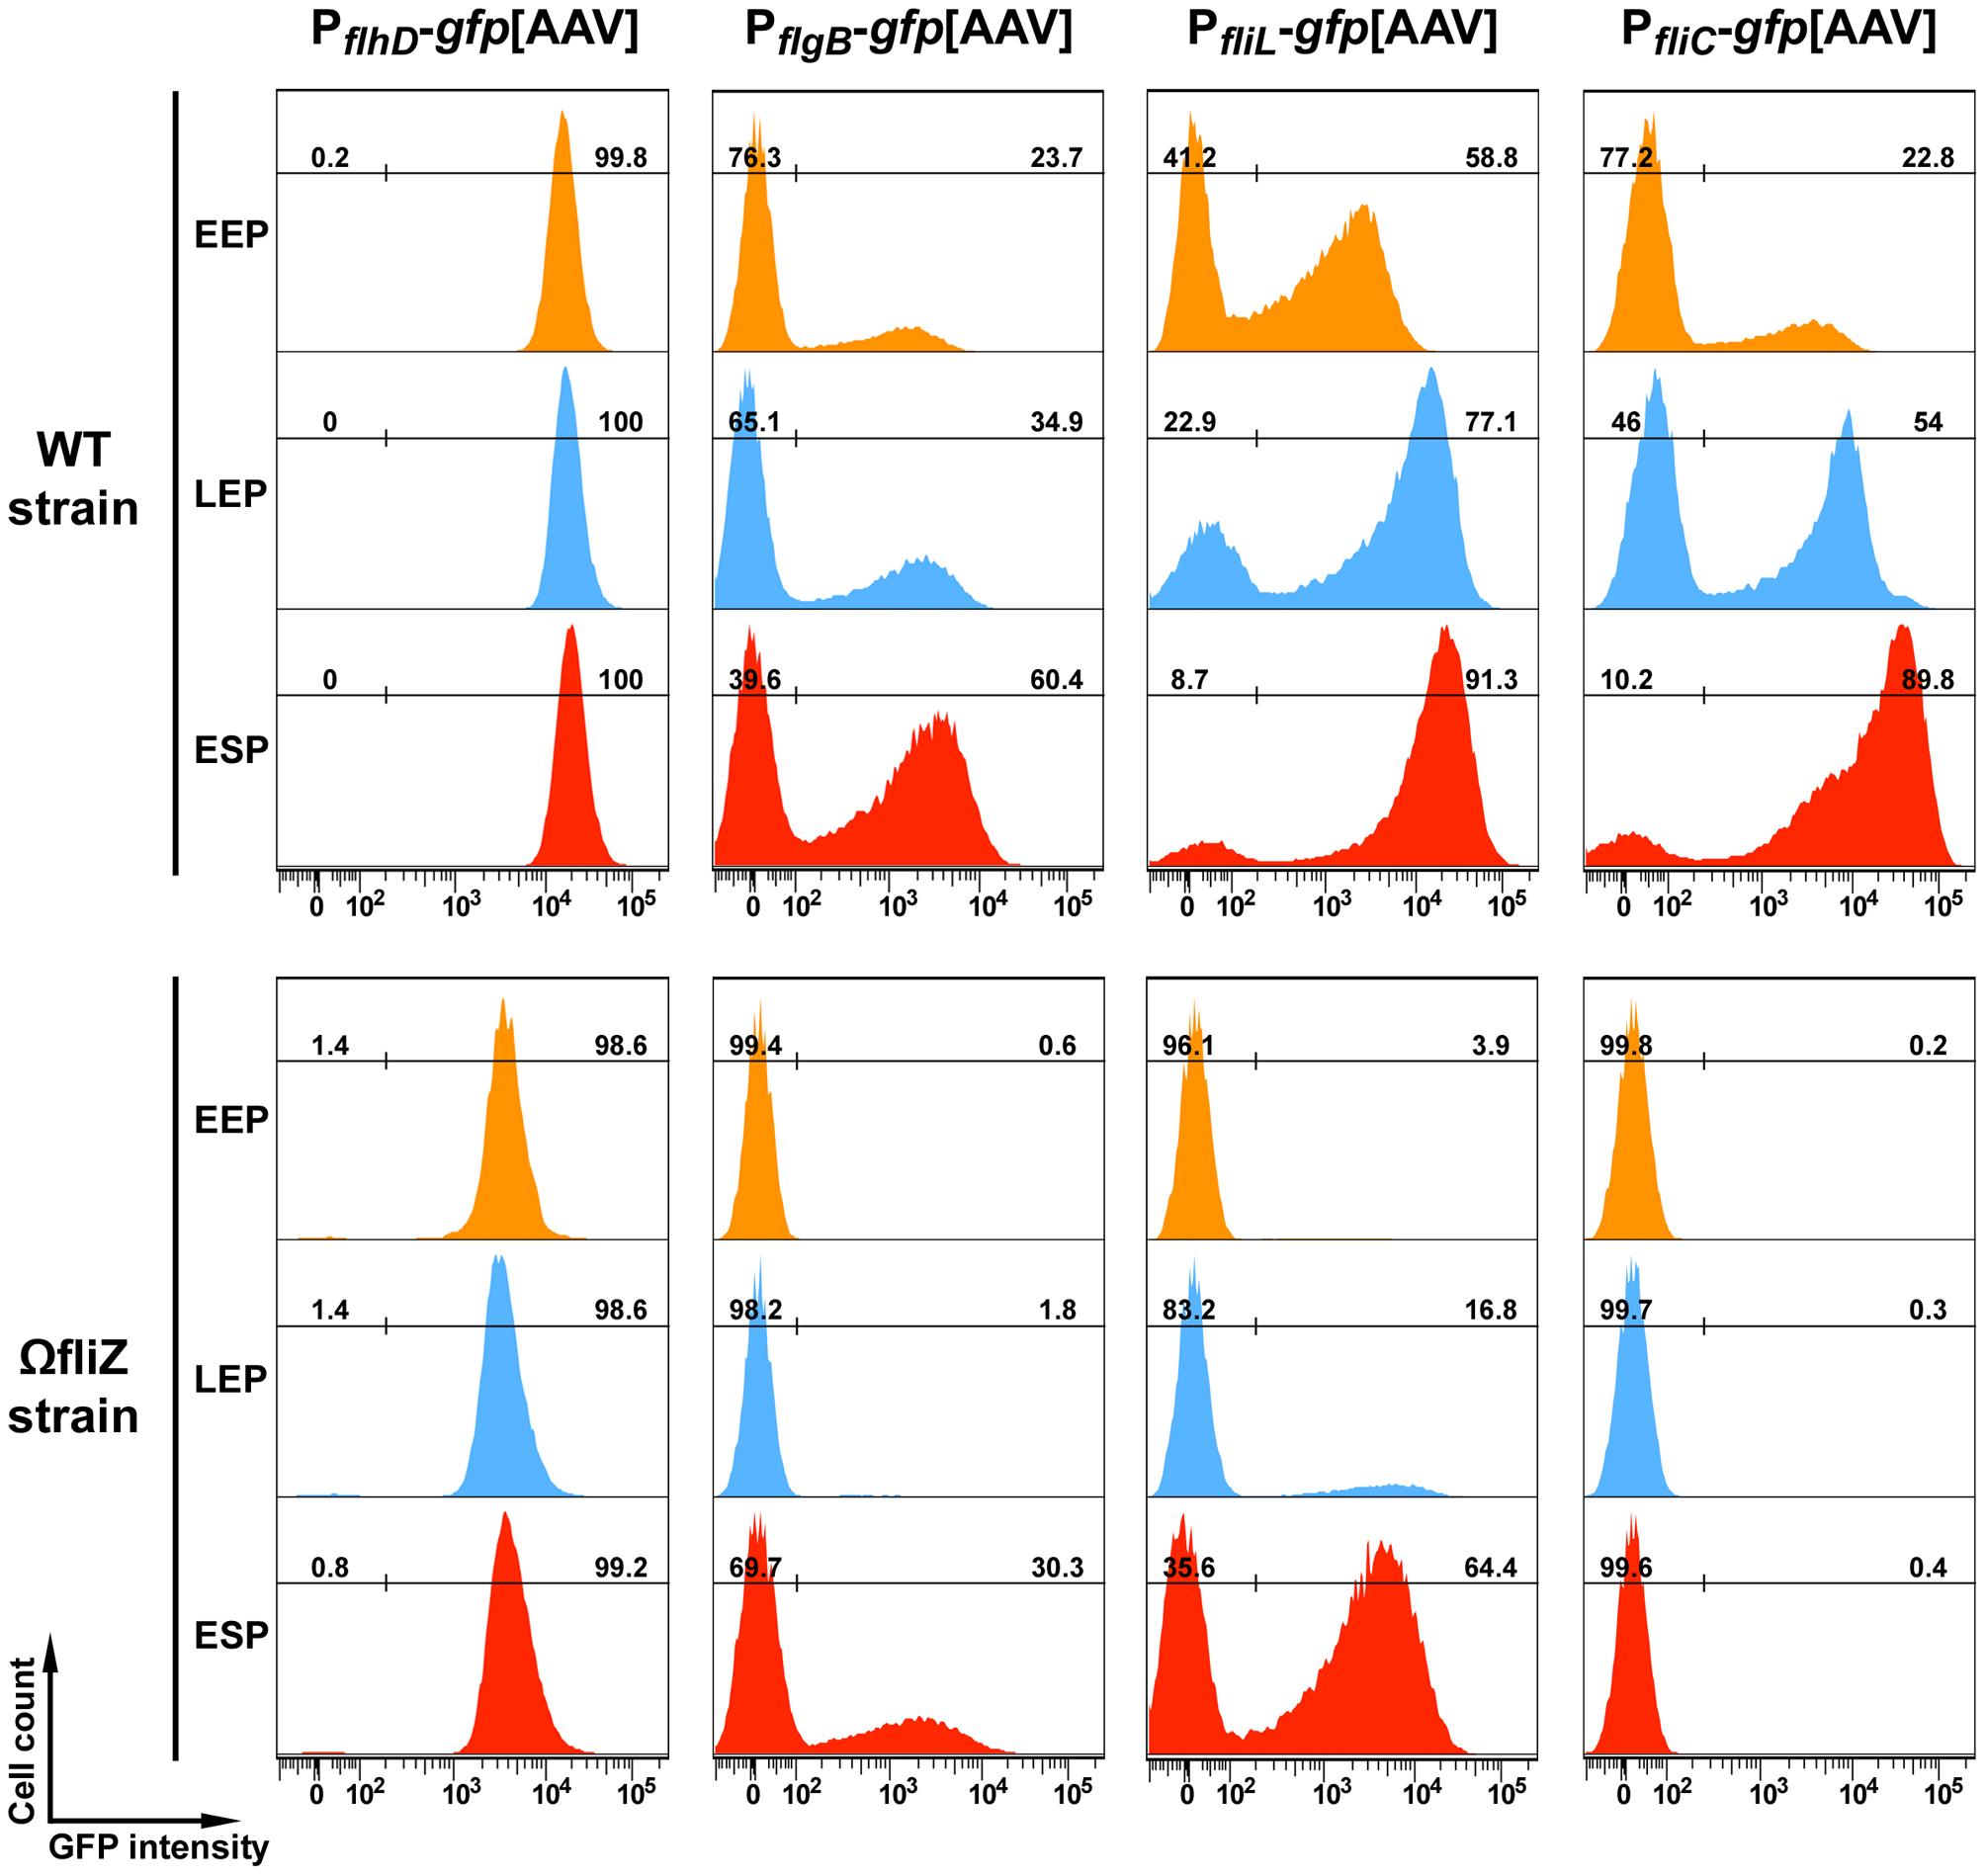 Time-course of P<i><sub>flhD</sub></i>, P<i><sub>flgB</sub></i> , P<i><sub>fliL</sub></i> and P<i><sub>fliC</sub></i> promoter activities in wild type and <i>fliZ</i> strains.